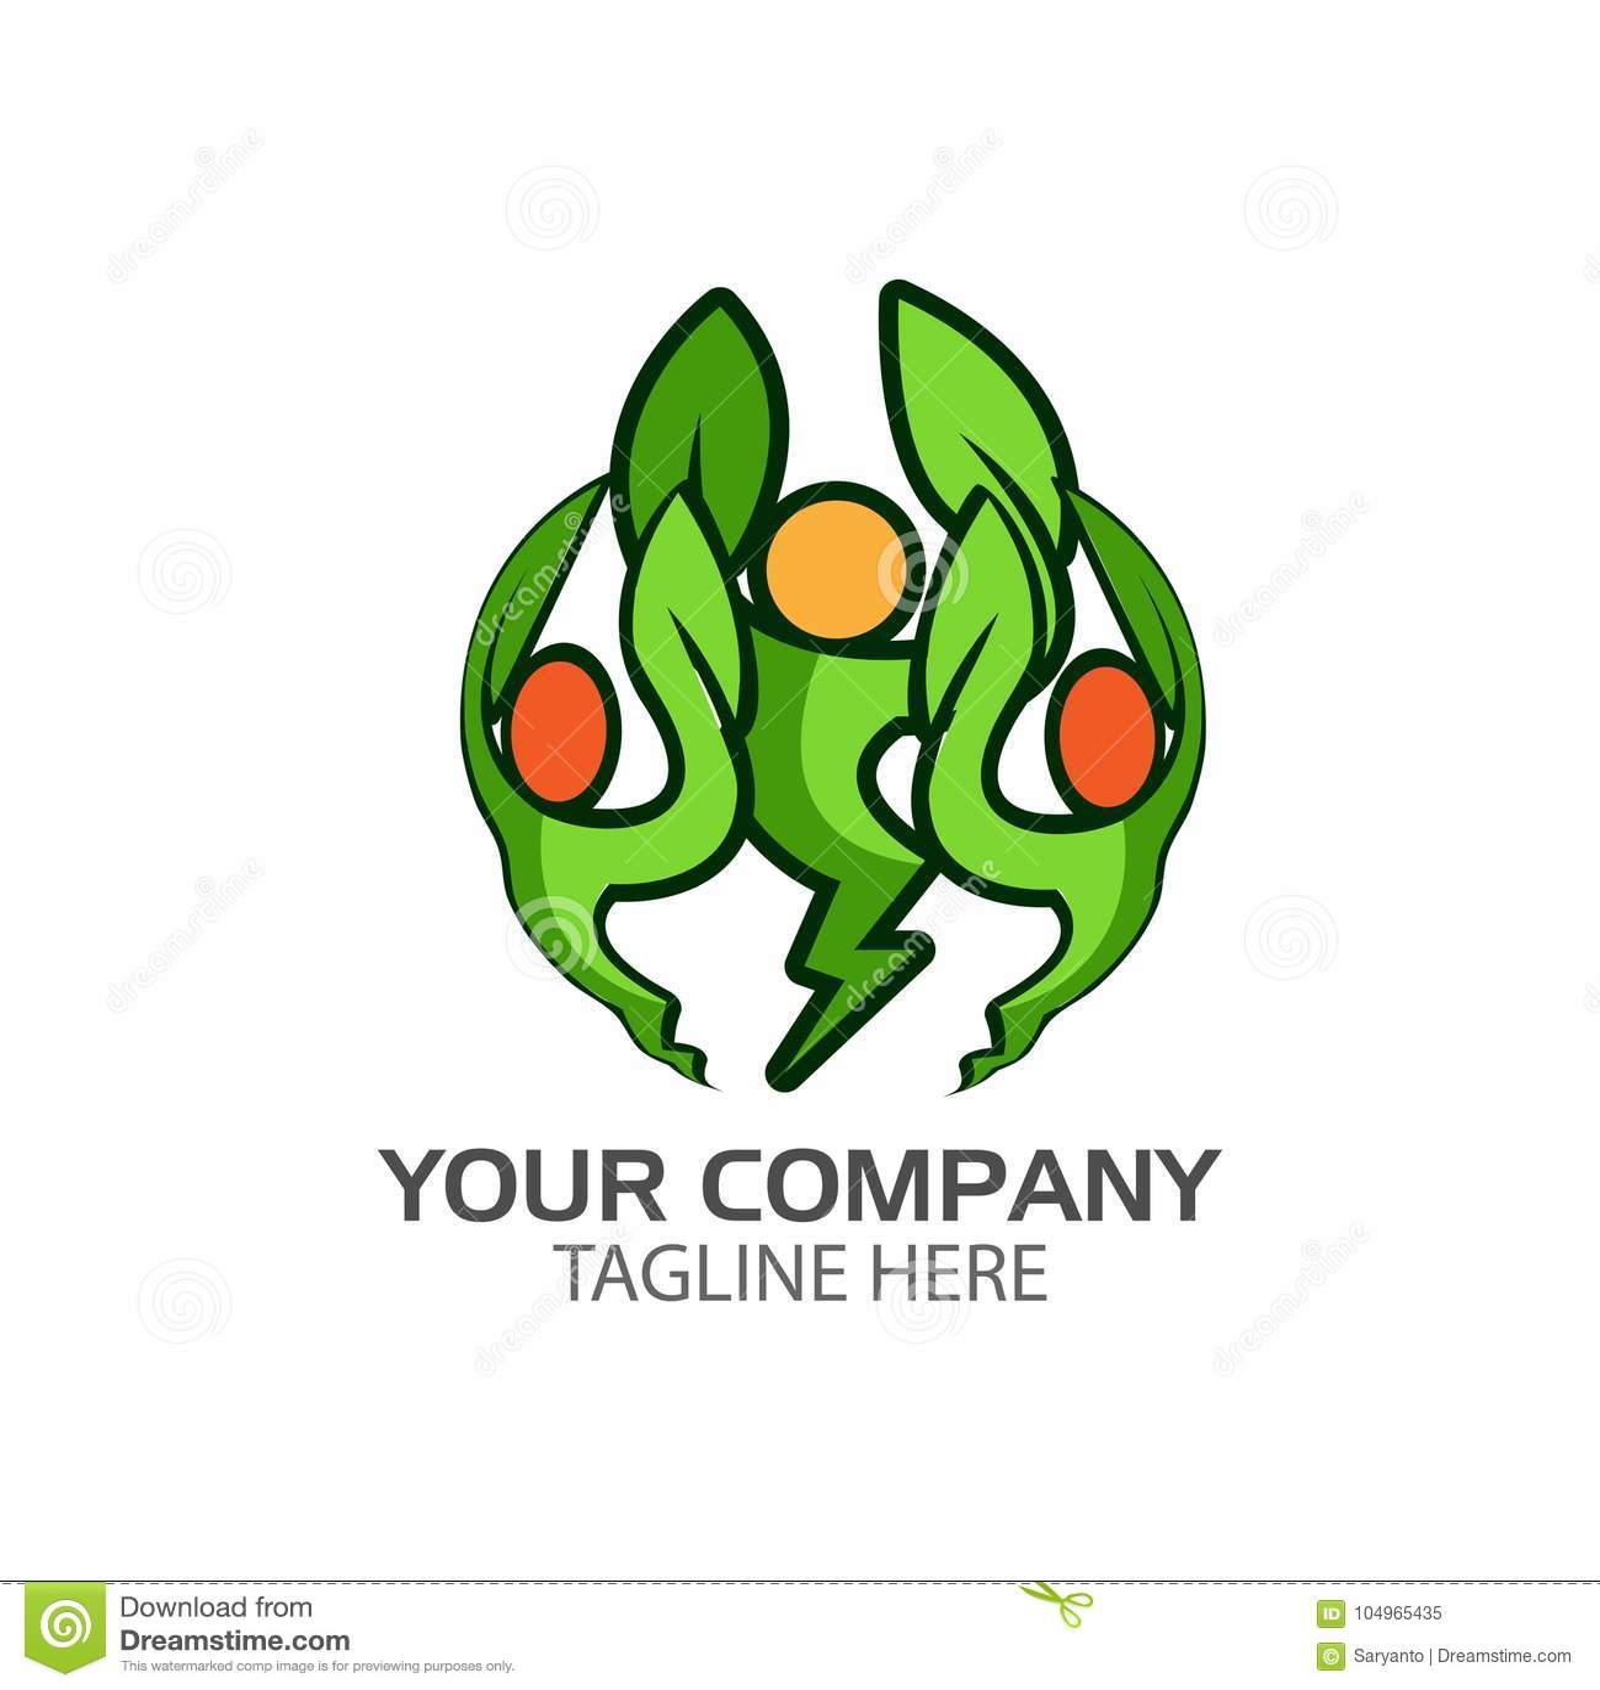 Go green symbols image collections symbol and sign ideas human leaf with electric symbols logo leaves go green active human leaf with electric symbols logo buycottarizona